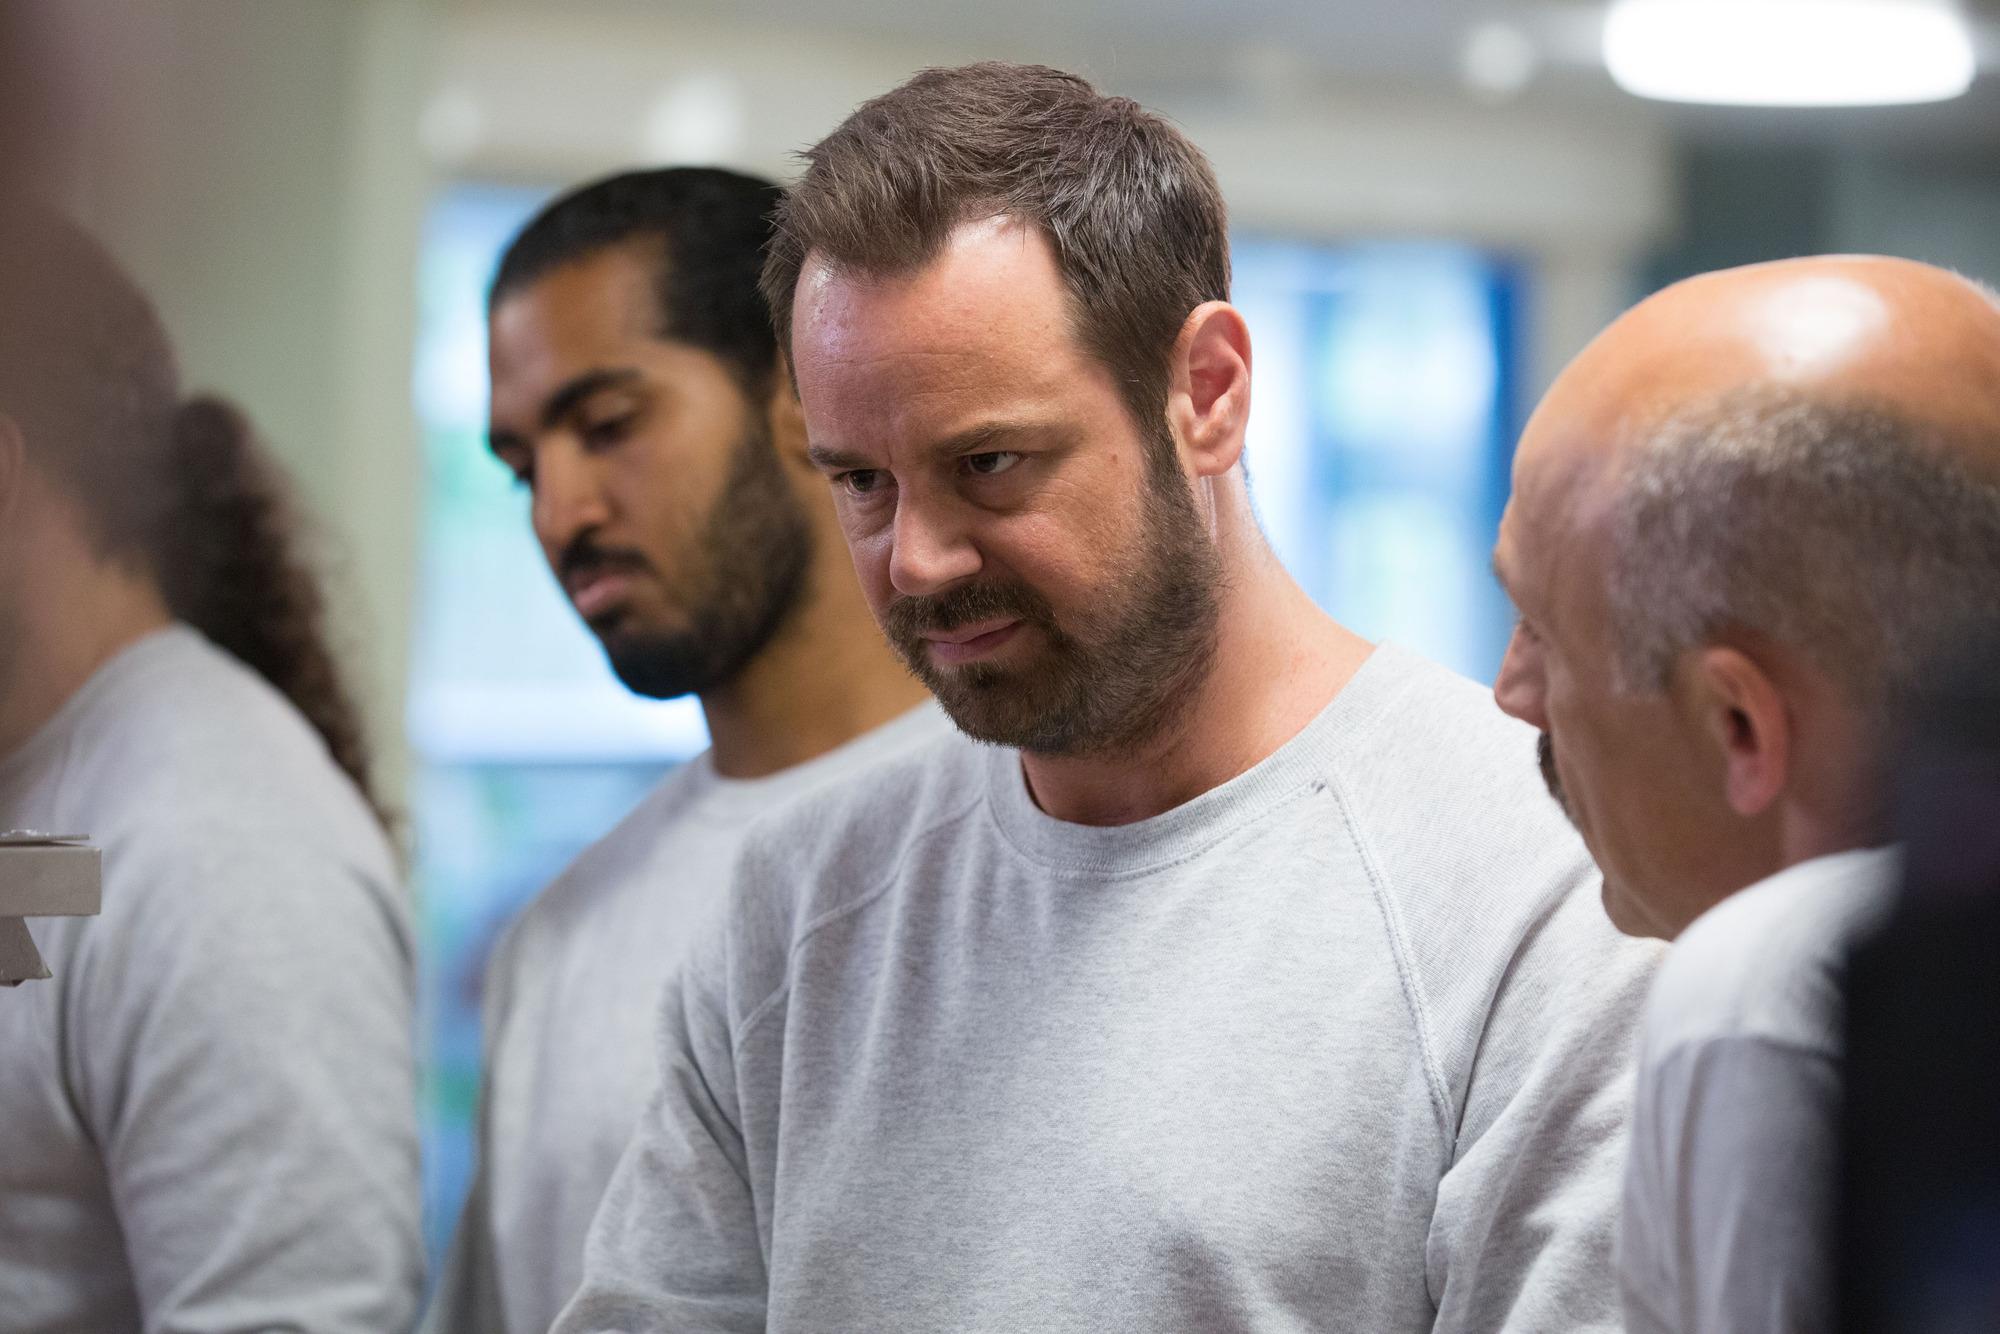 EastEnders spoilers: Mick Carter faces years in prison for shooting Stuart Highway